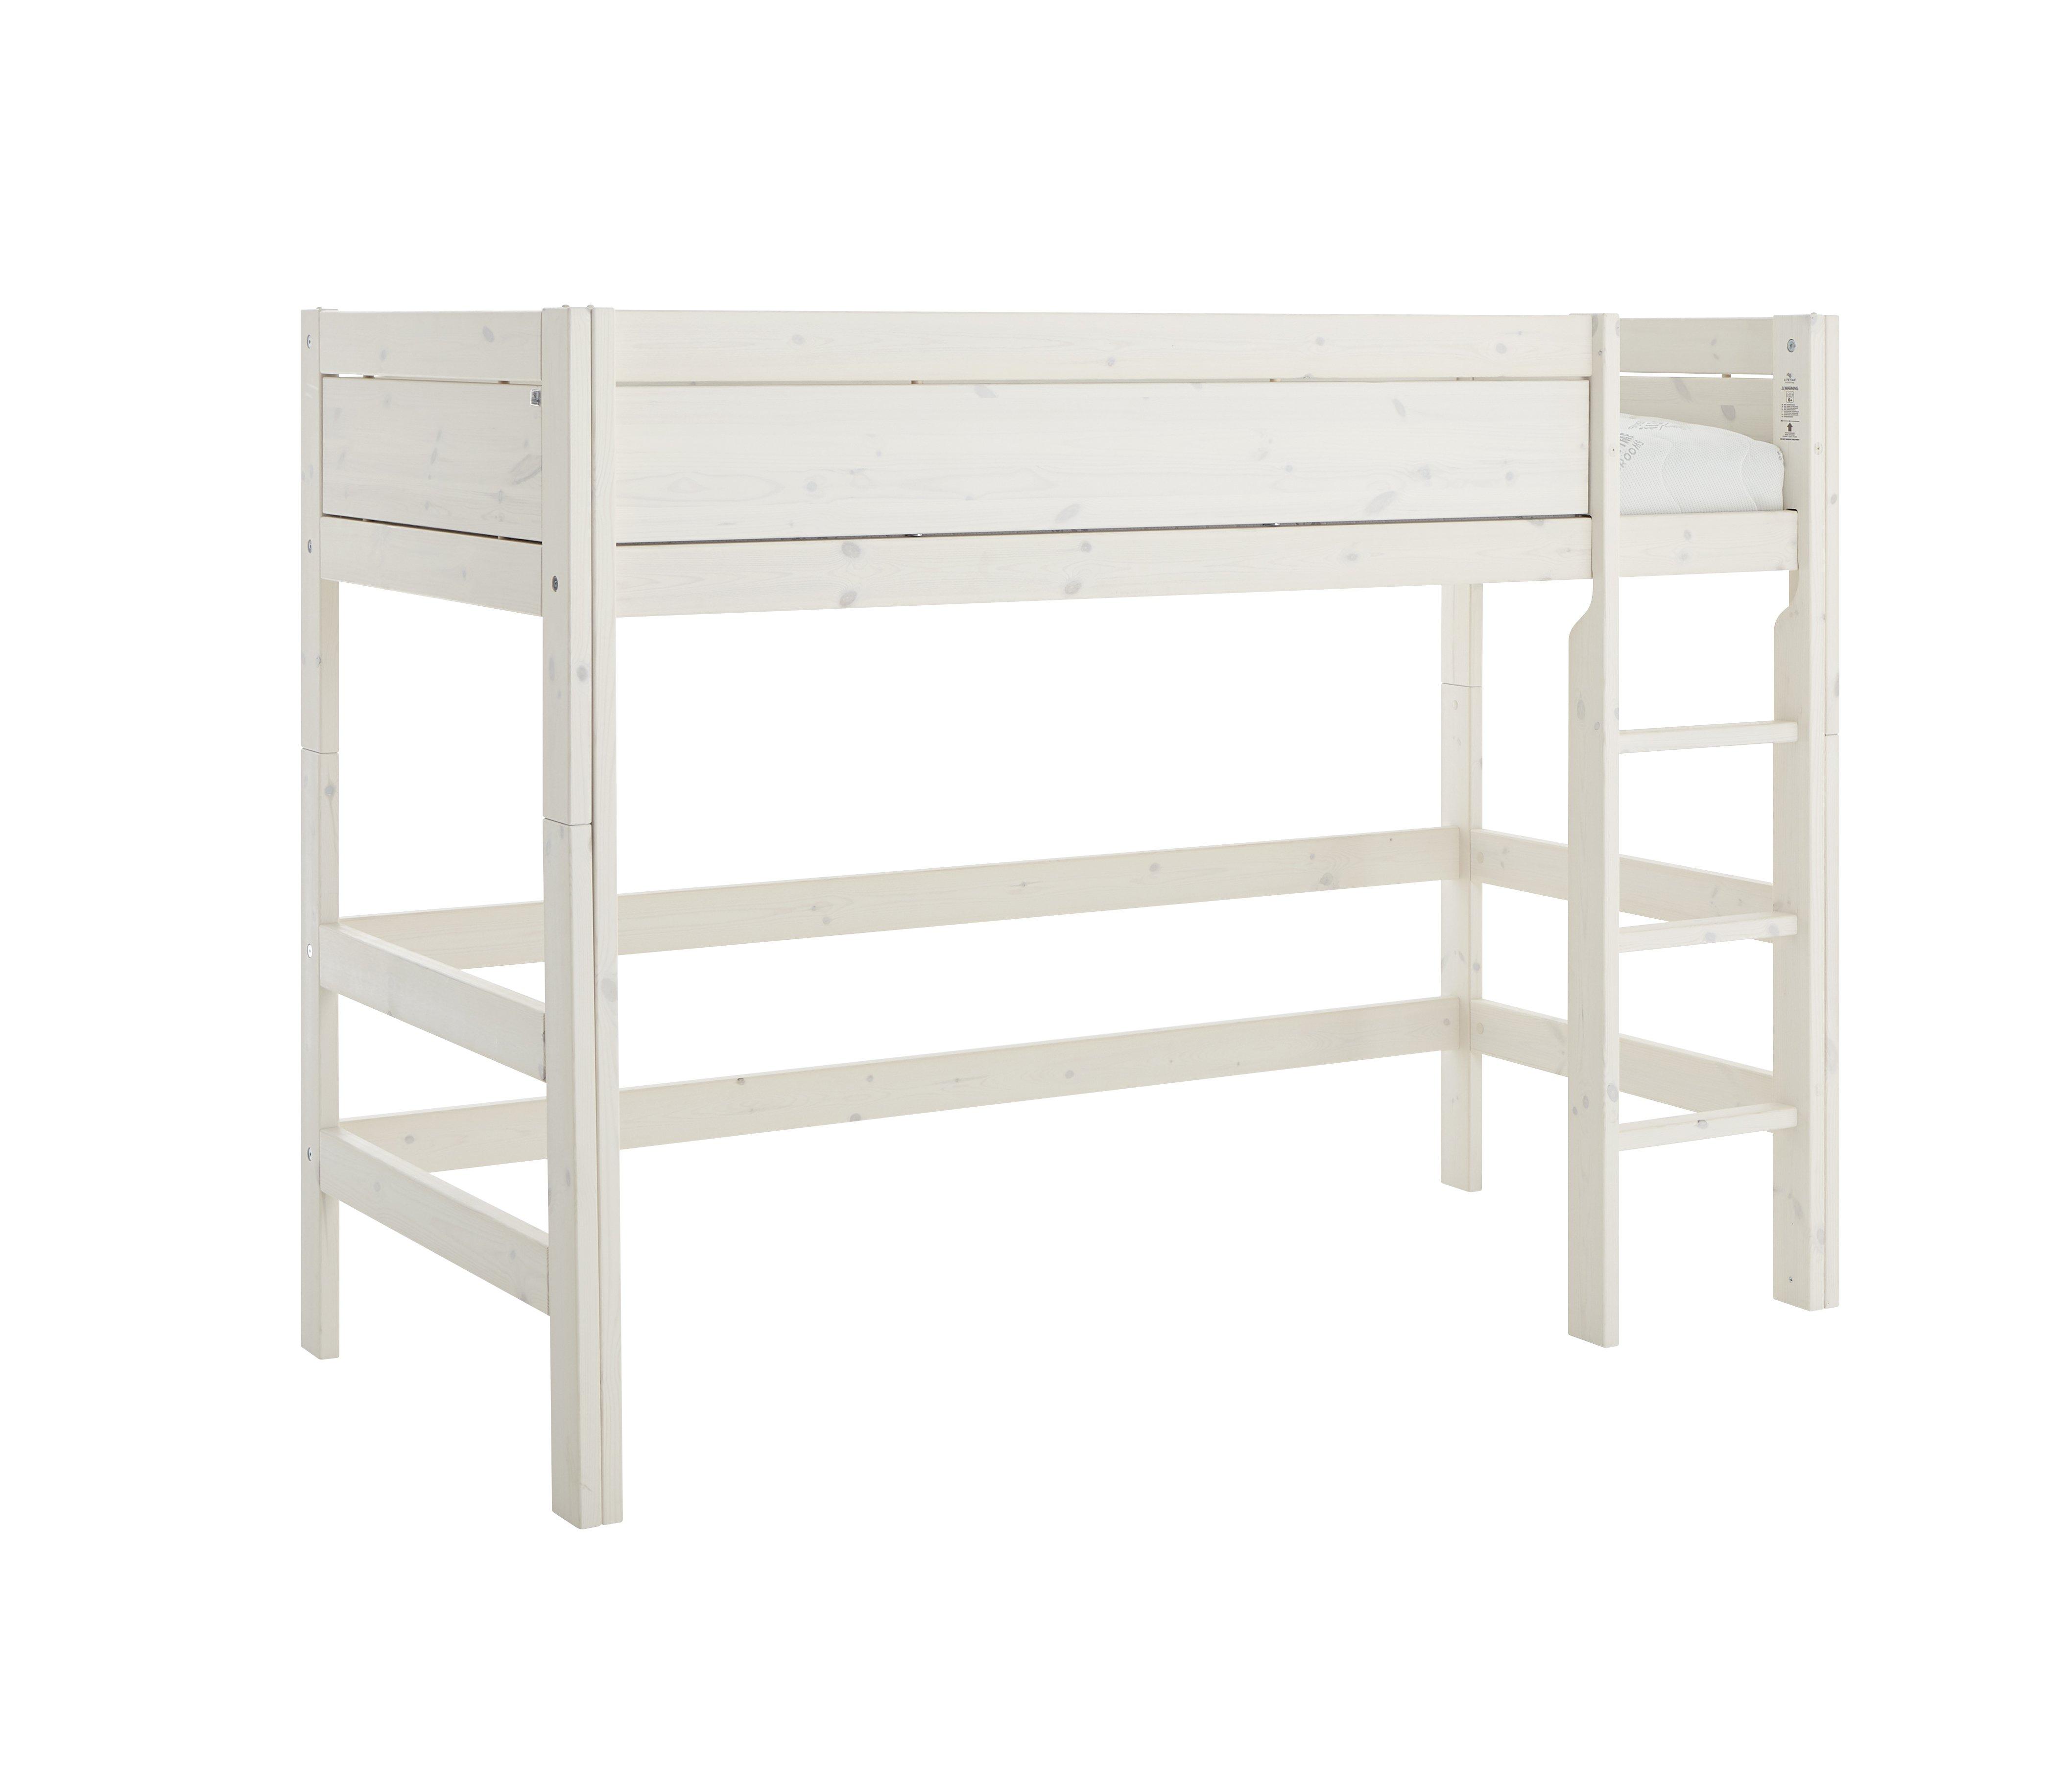 Corner bunk loft bed in 2020 Loft bed, Low loft beds